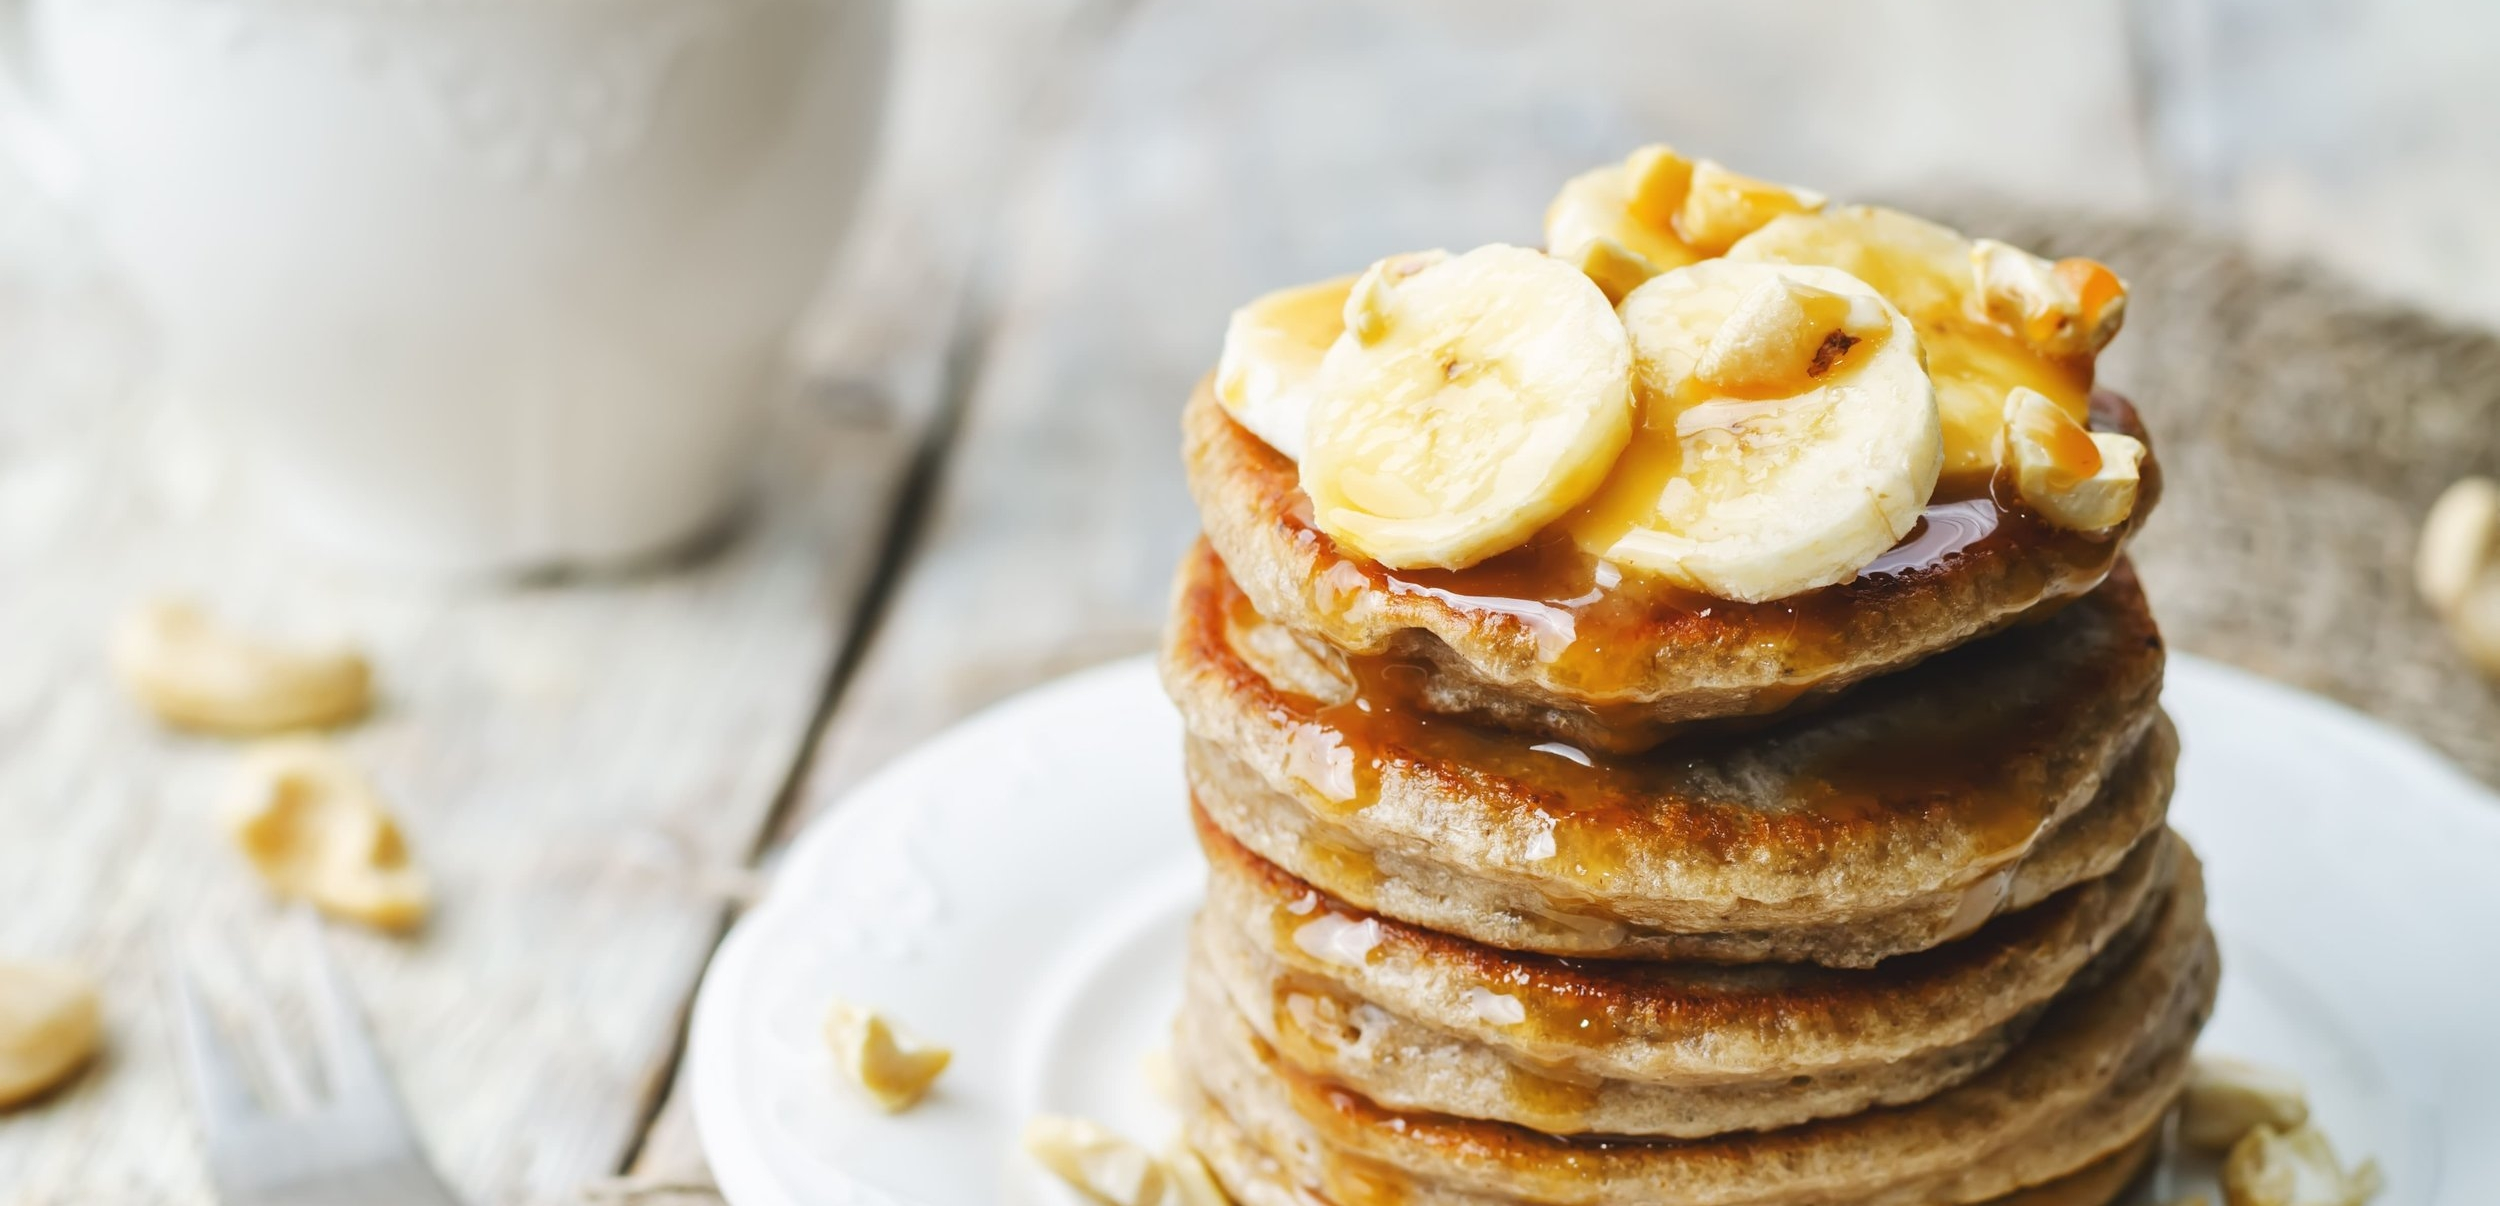 protein-packed-banana-oatmeal-pancakes.jpg